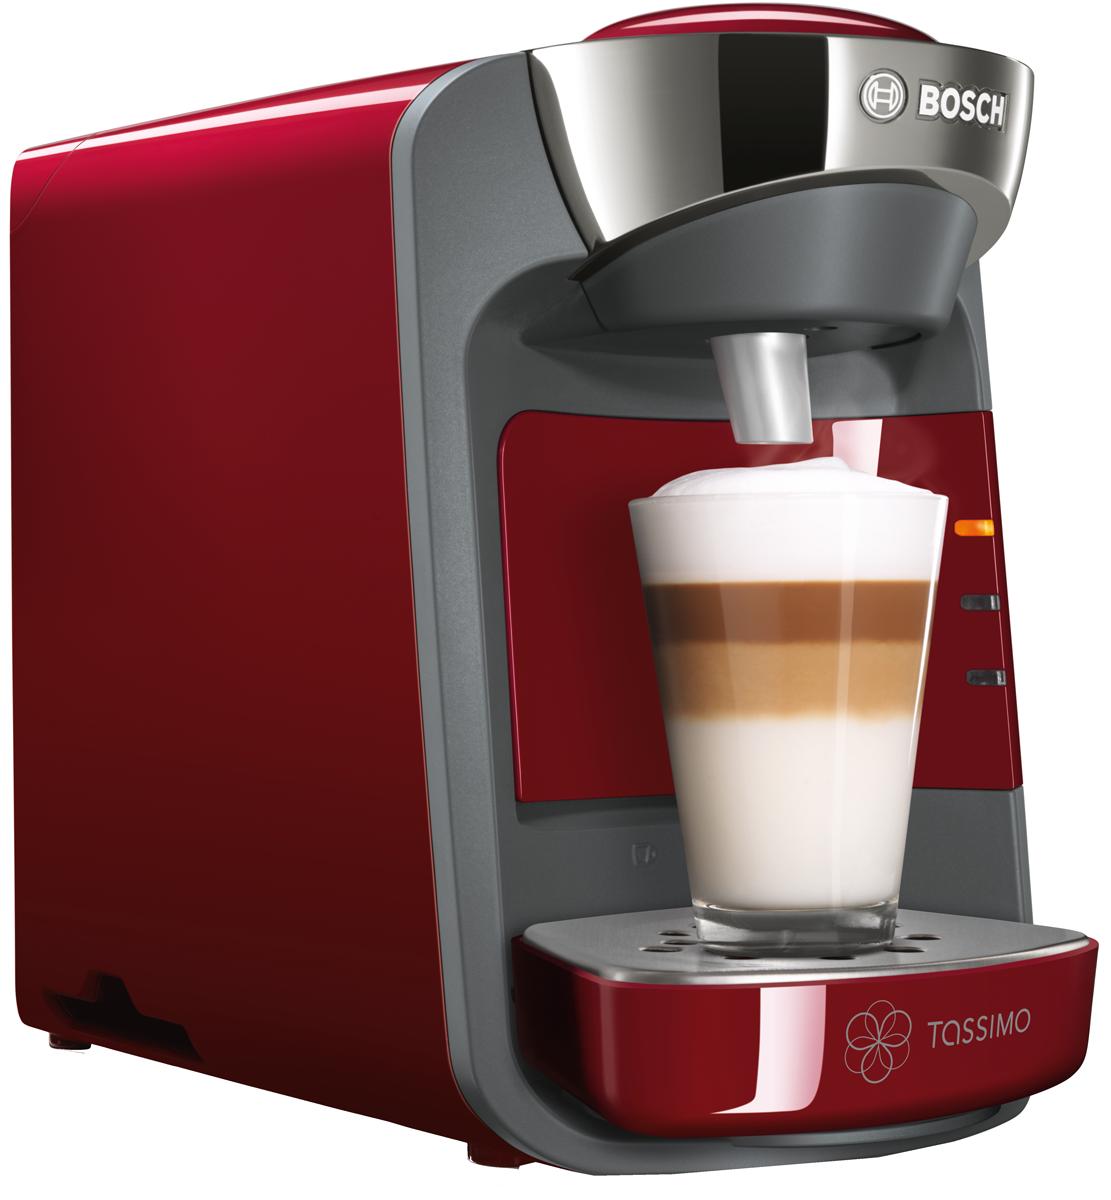 bosch suny tas3203ch rouge machine caf de tassimo acheter bas prix media markt. Black Bedroom Furniture Sets. Home Design Ideas